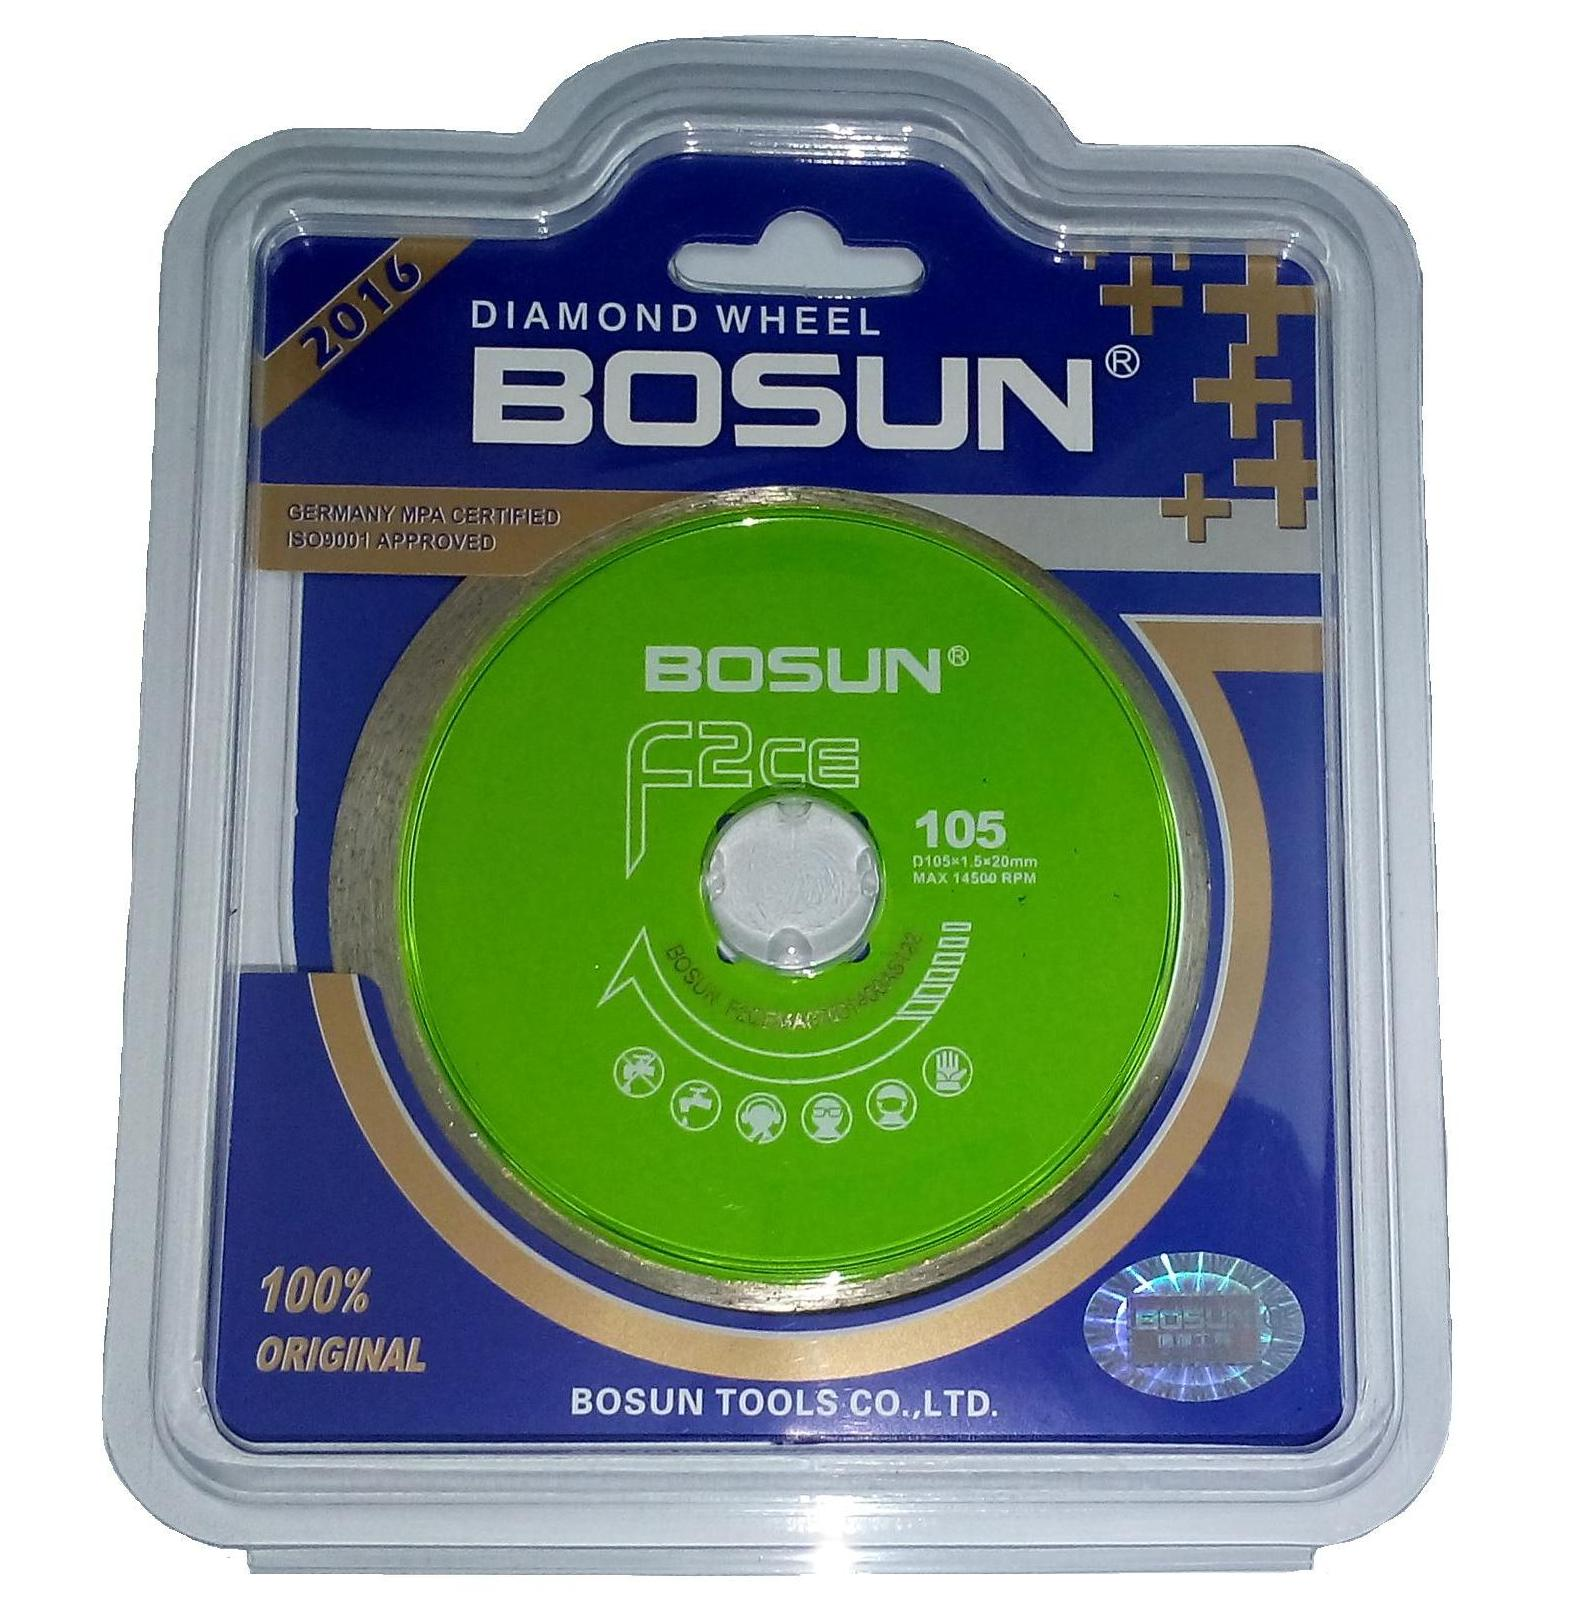 Lưỡi cắt F2CE Bosun (105x10x20mm)